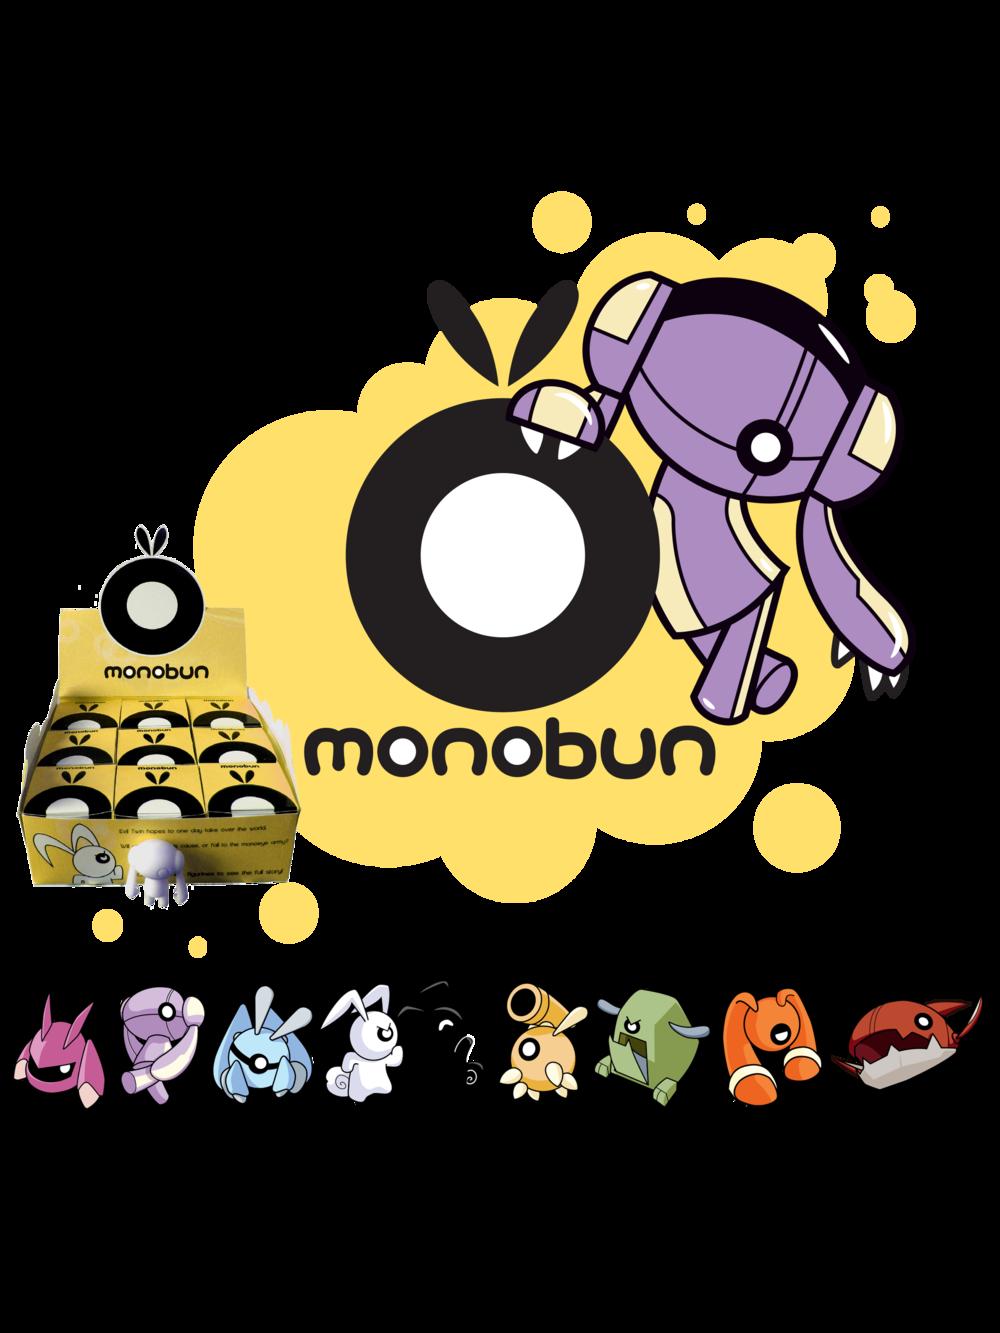 Monobun vinyl figure concept art